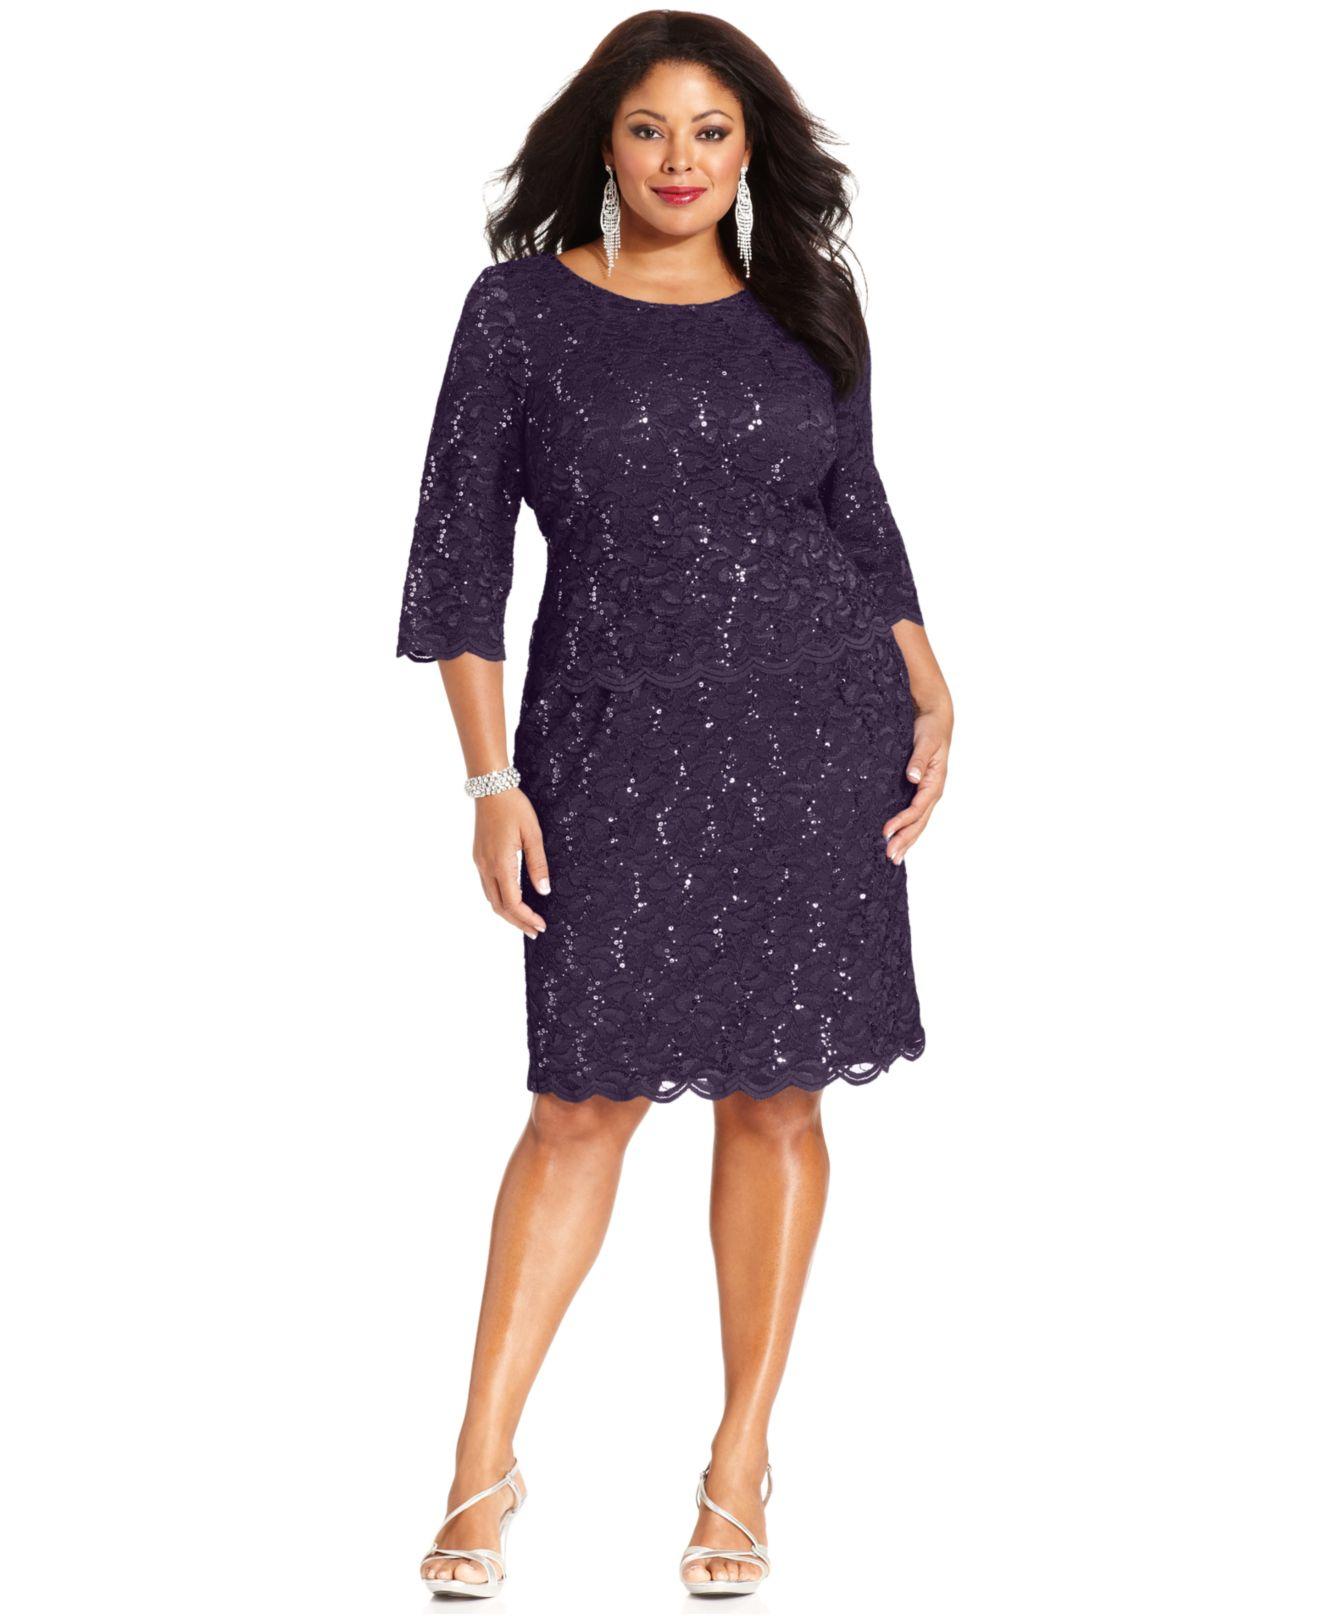 Alex Evenings Plus Size Sequined Lace Dress in Purple - Lyst